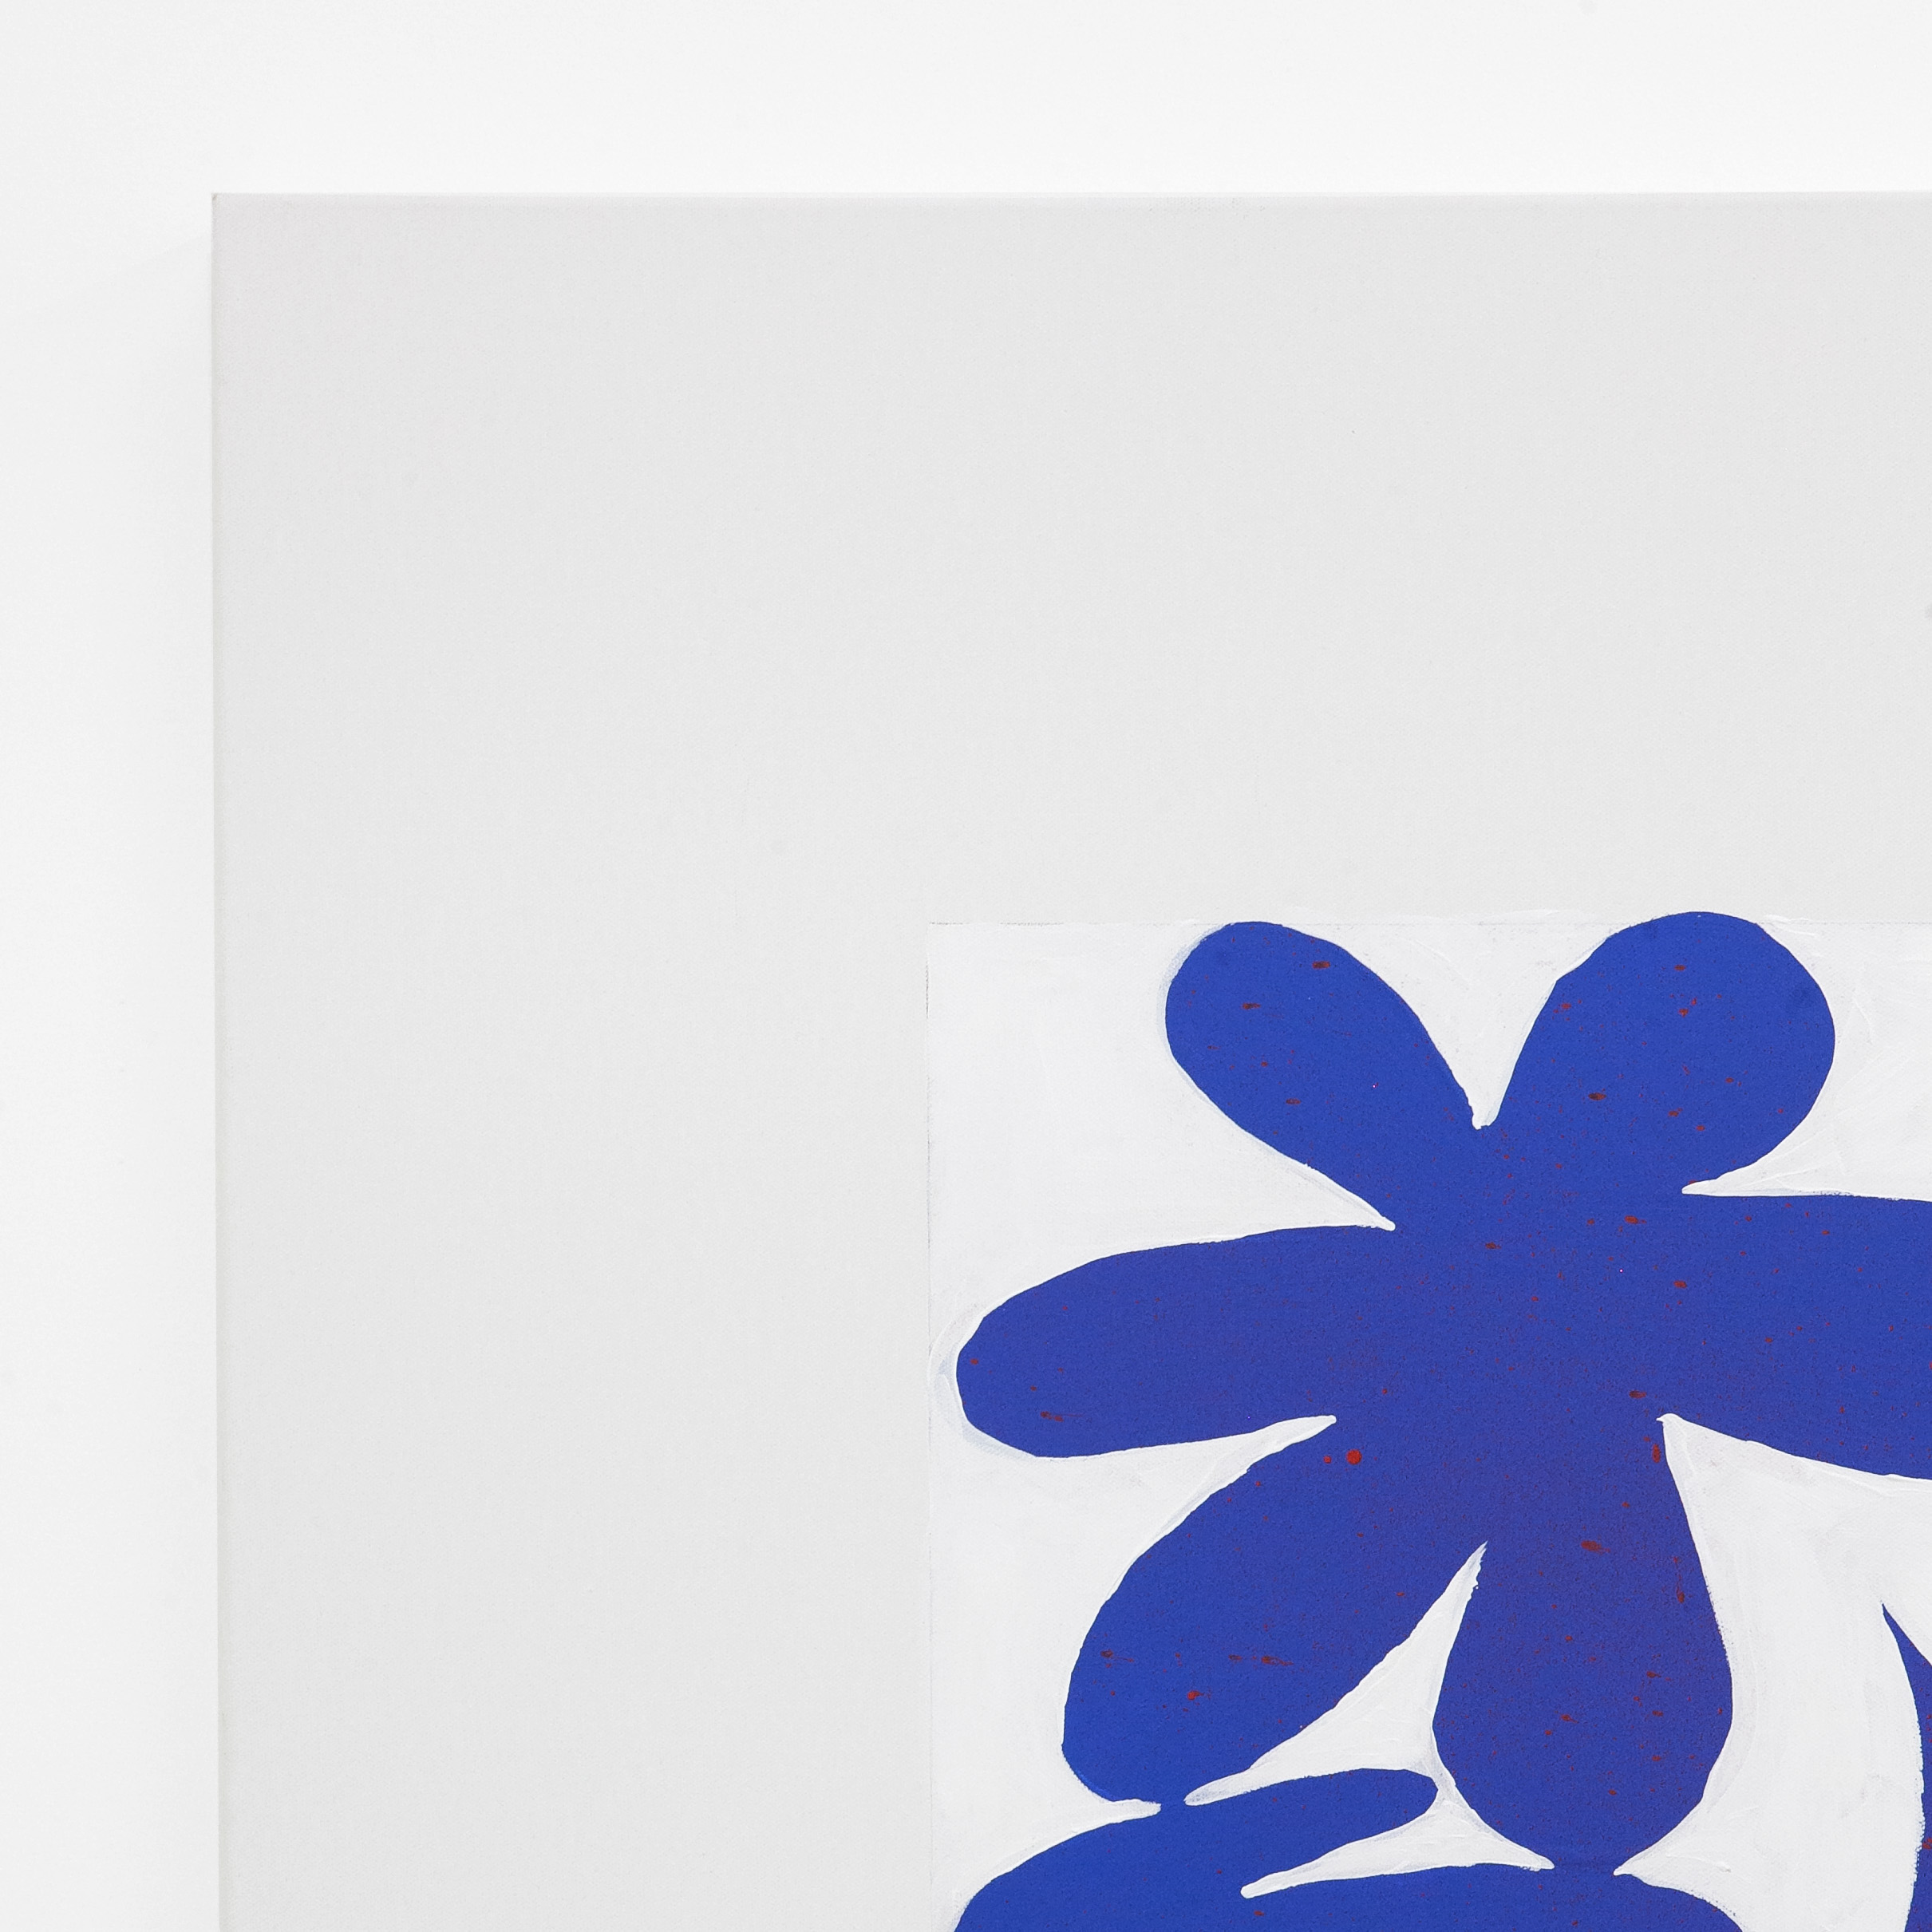 chazbear_lrg_square_blue_1.jpg